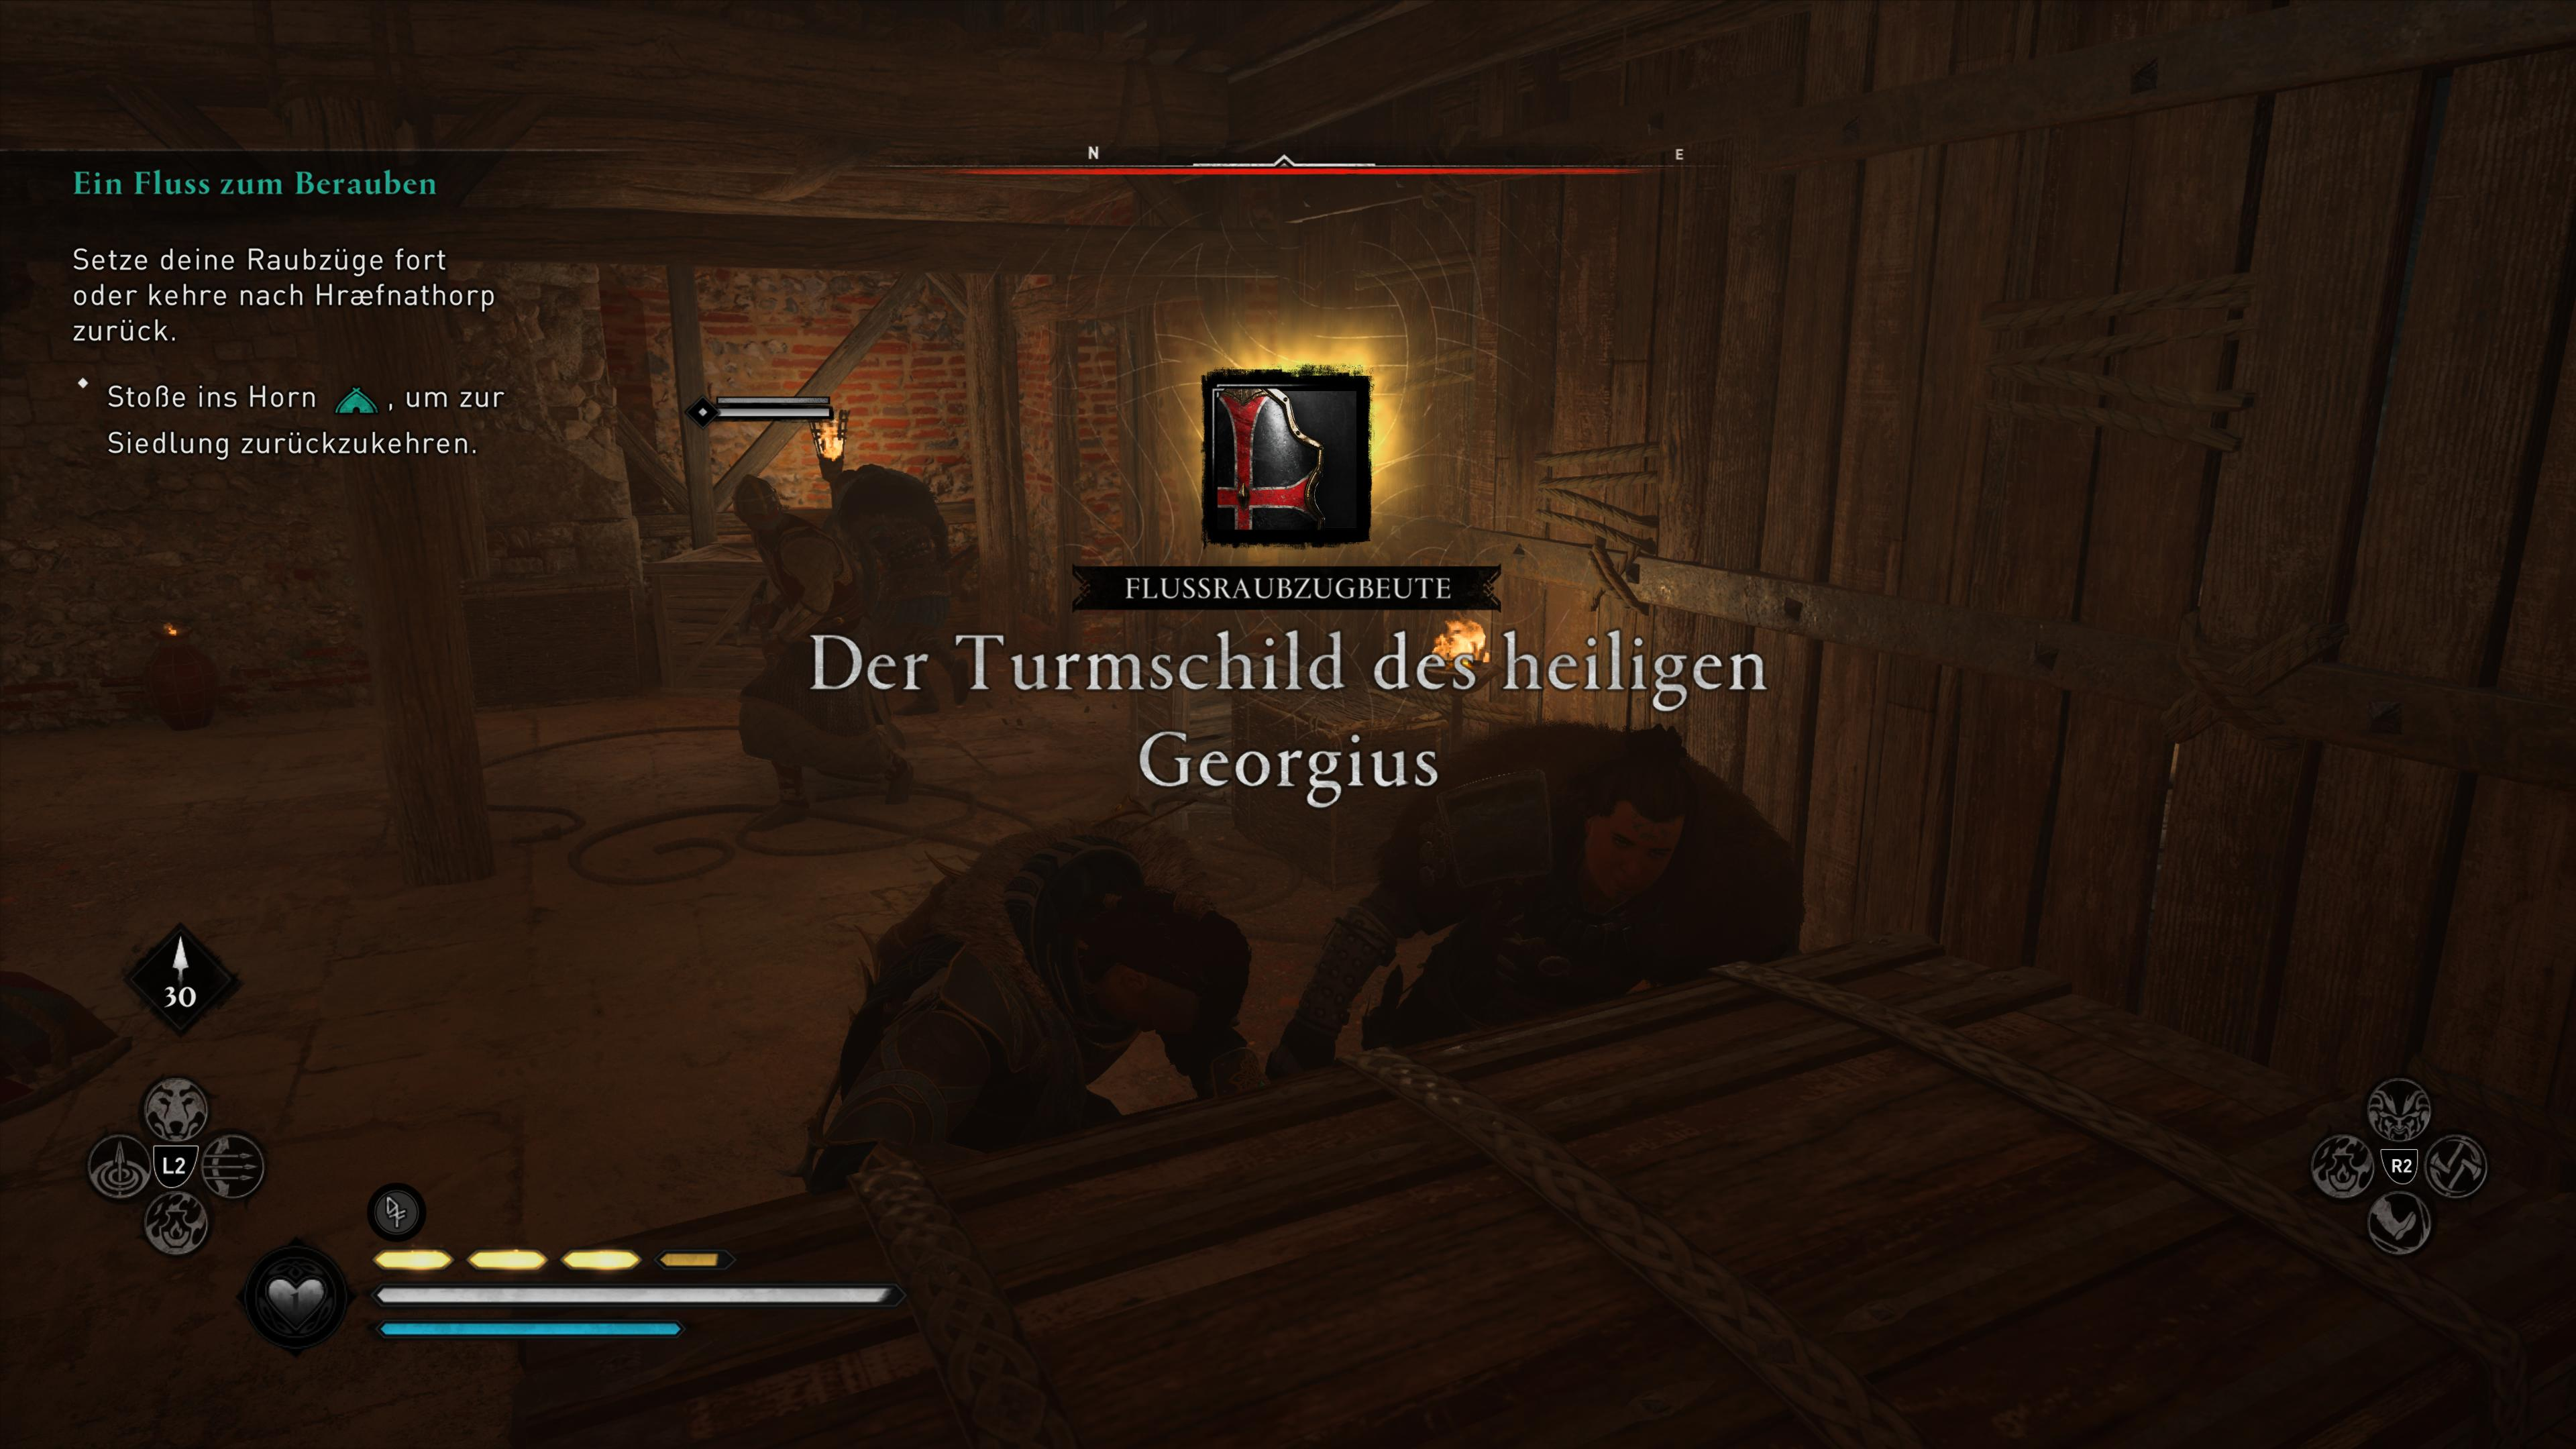 Assassin's Creed Valhalla Shield Georgius